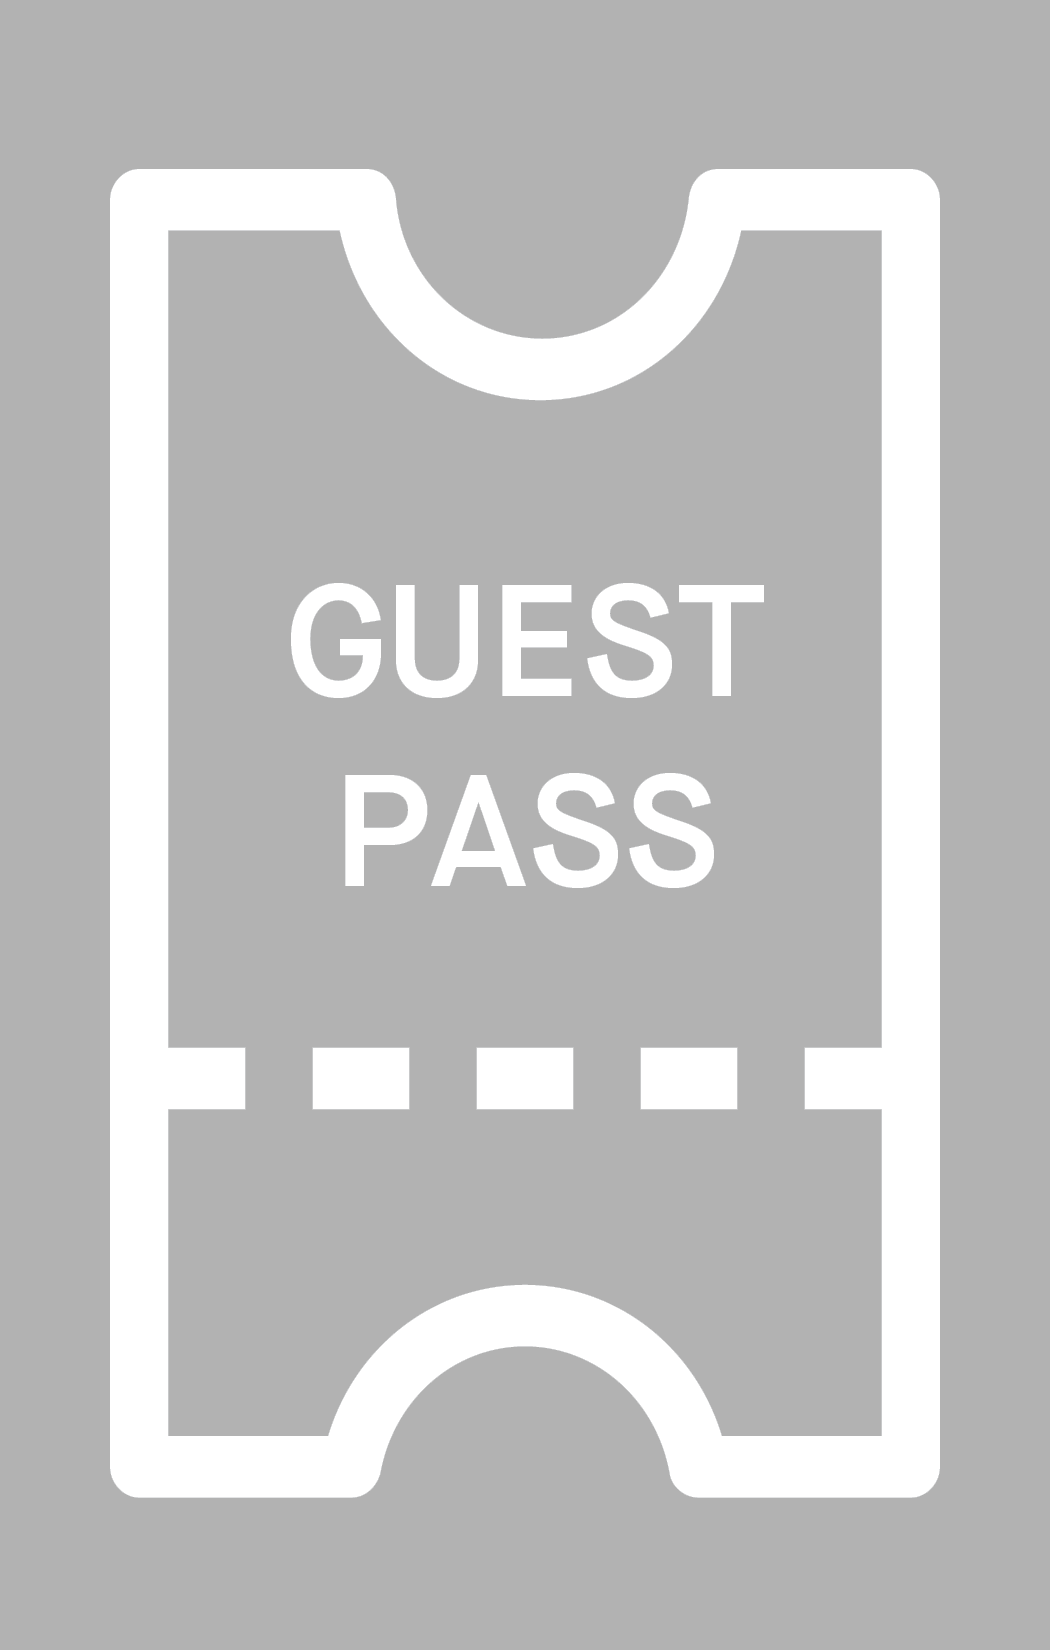 guestpass_designfile.png